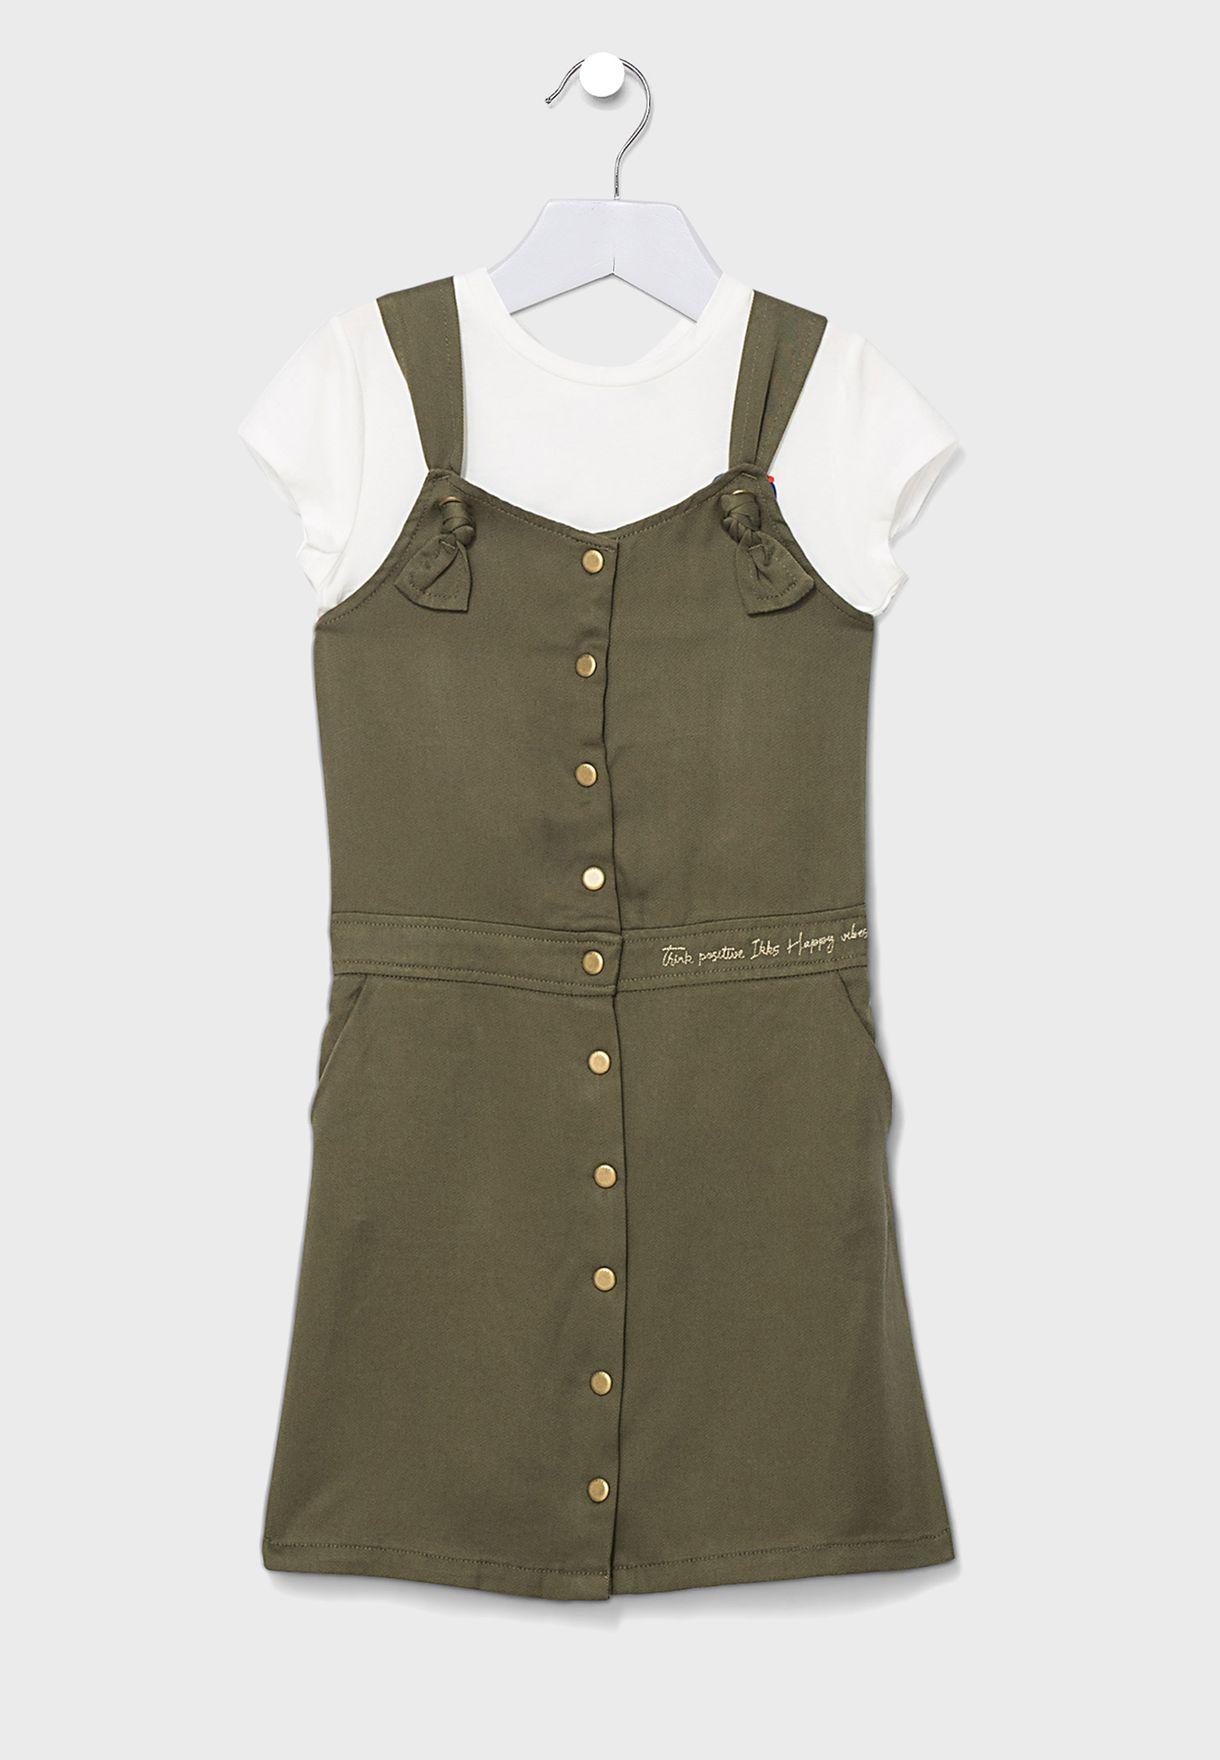 طقم فستان دنغري + تيشيرت للاطفال